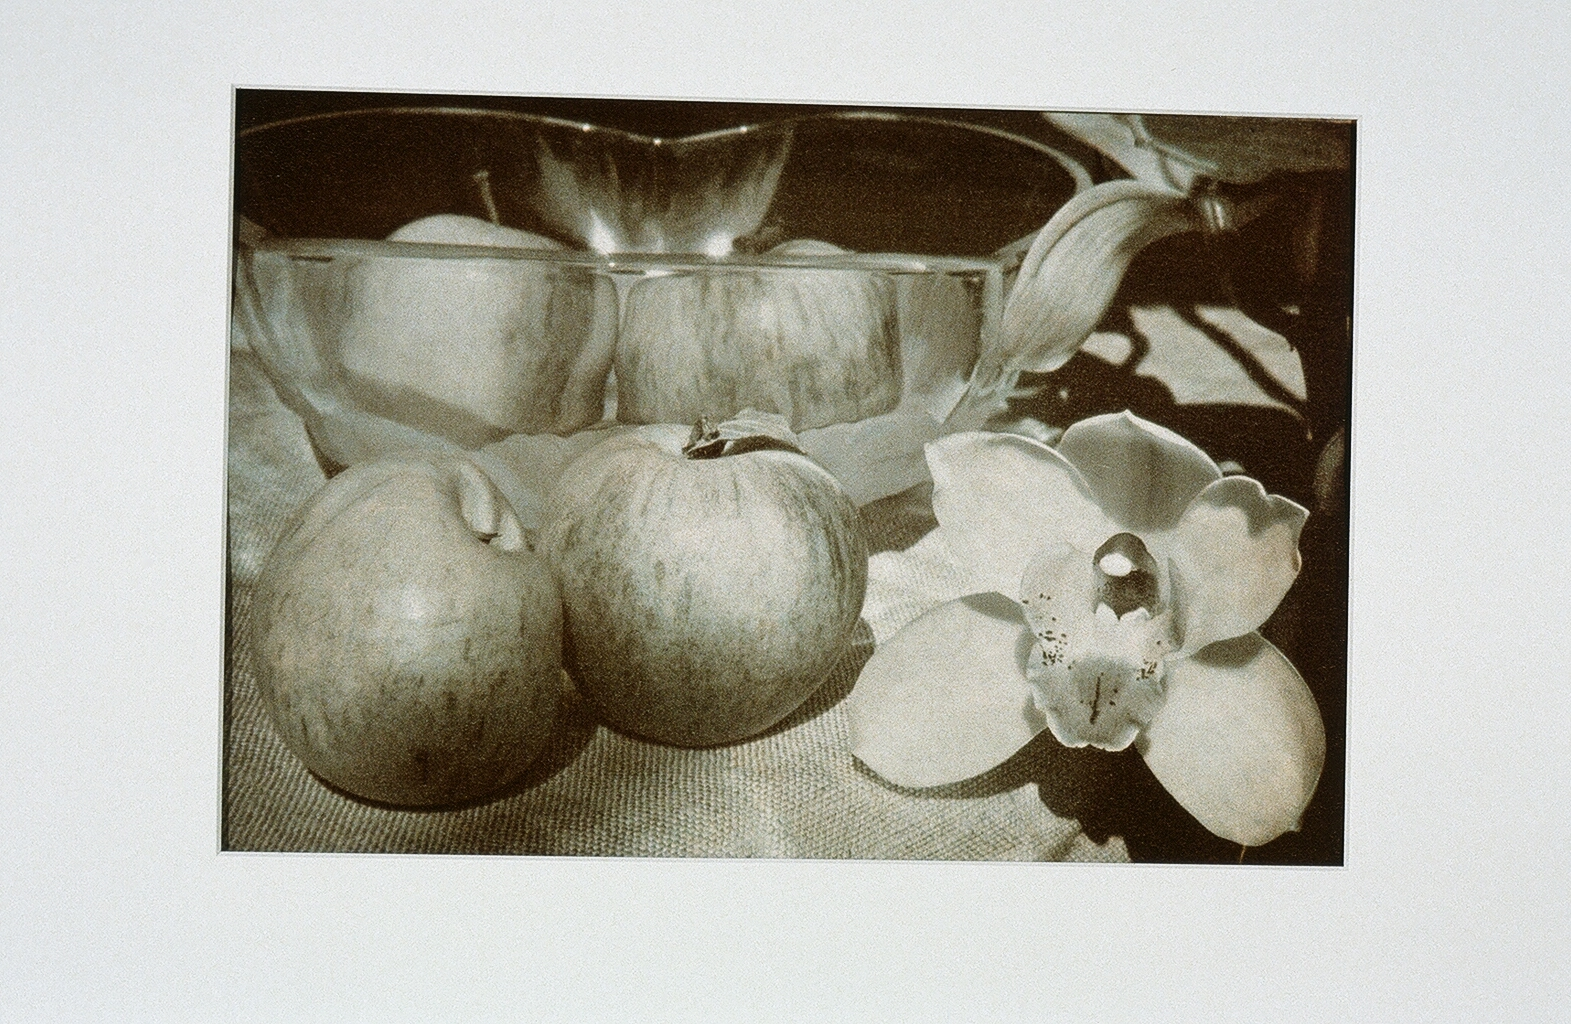 Apples & Cymbidium